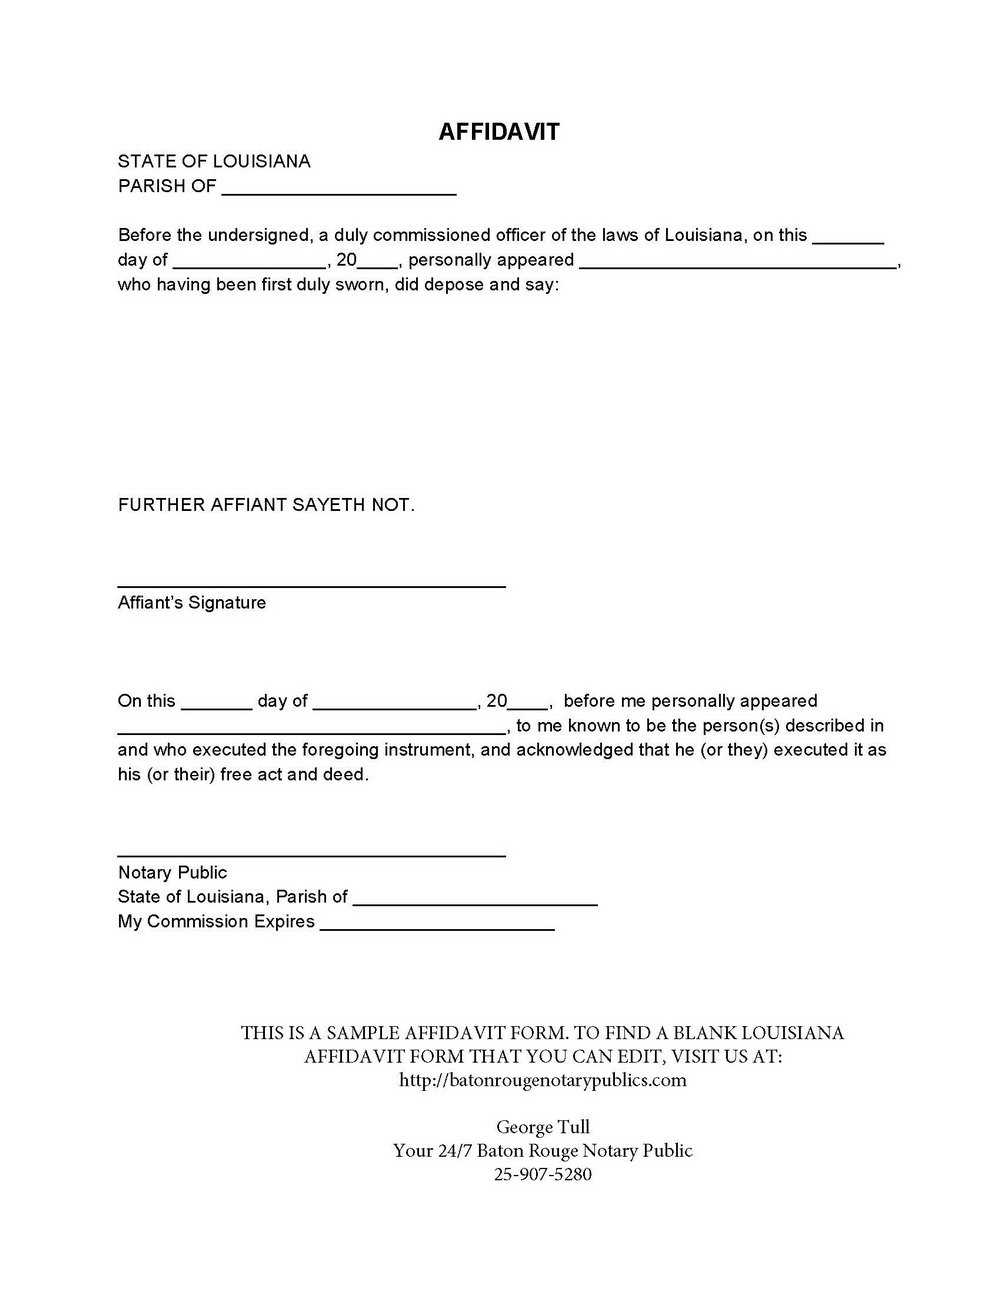 Affidavit Template Florida